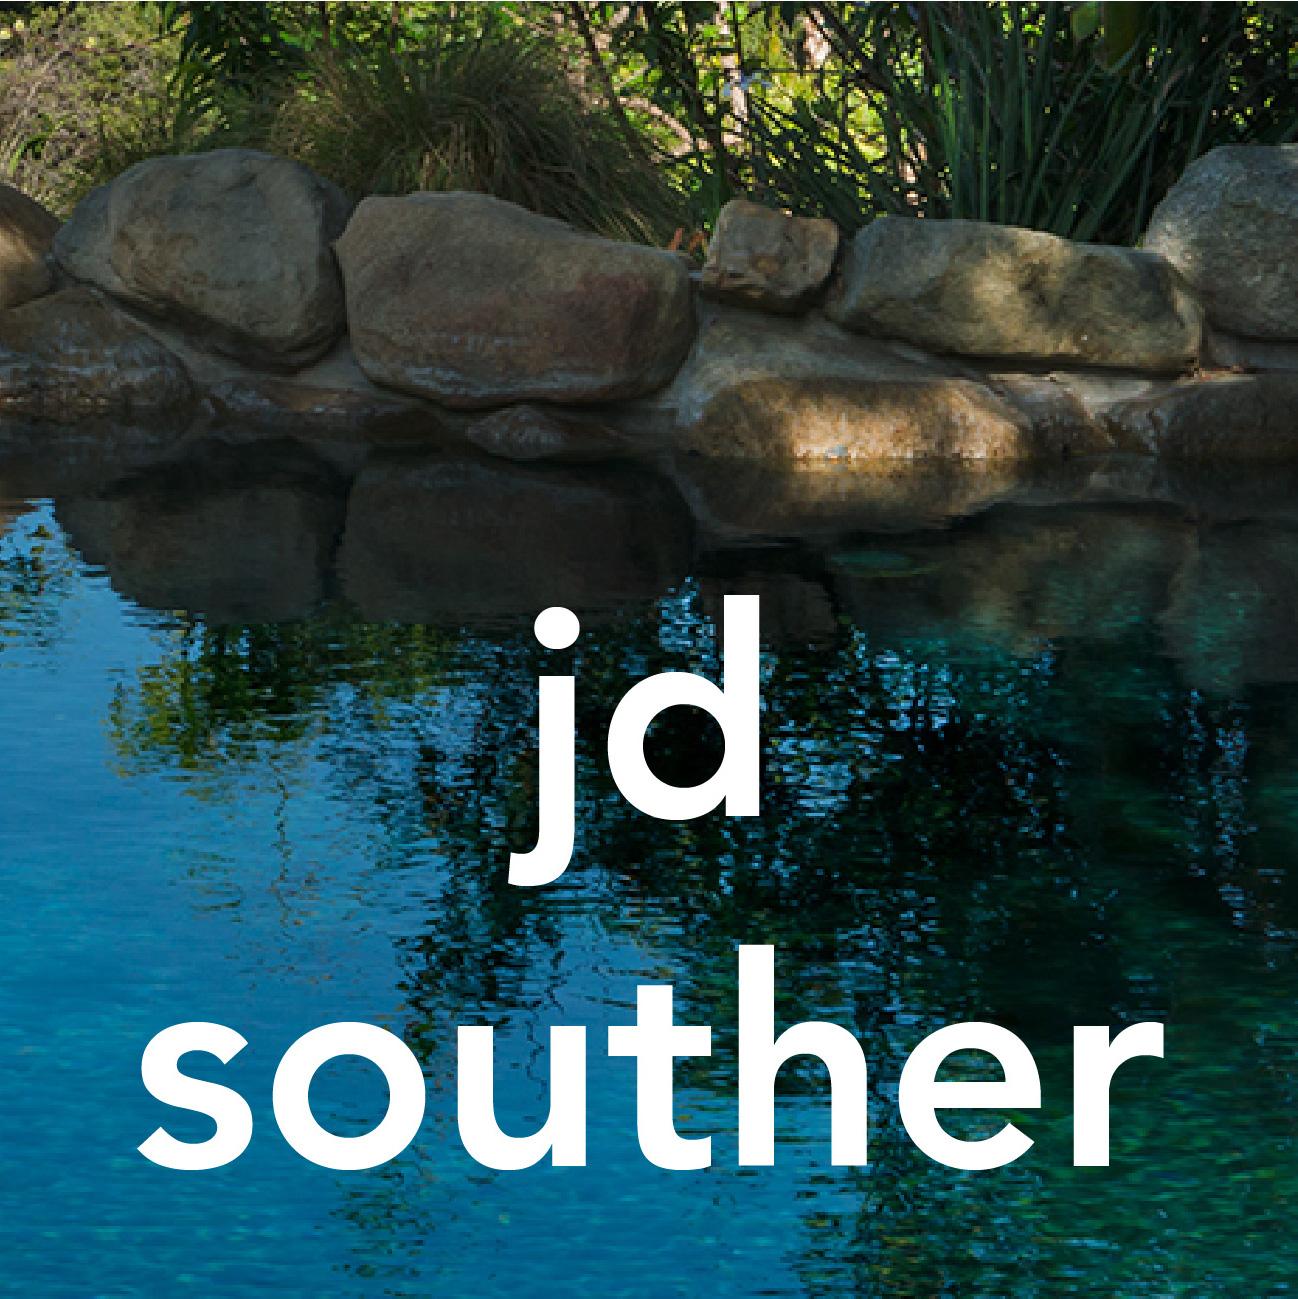 jd souther.jpg